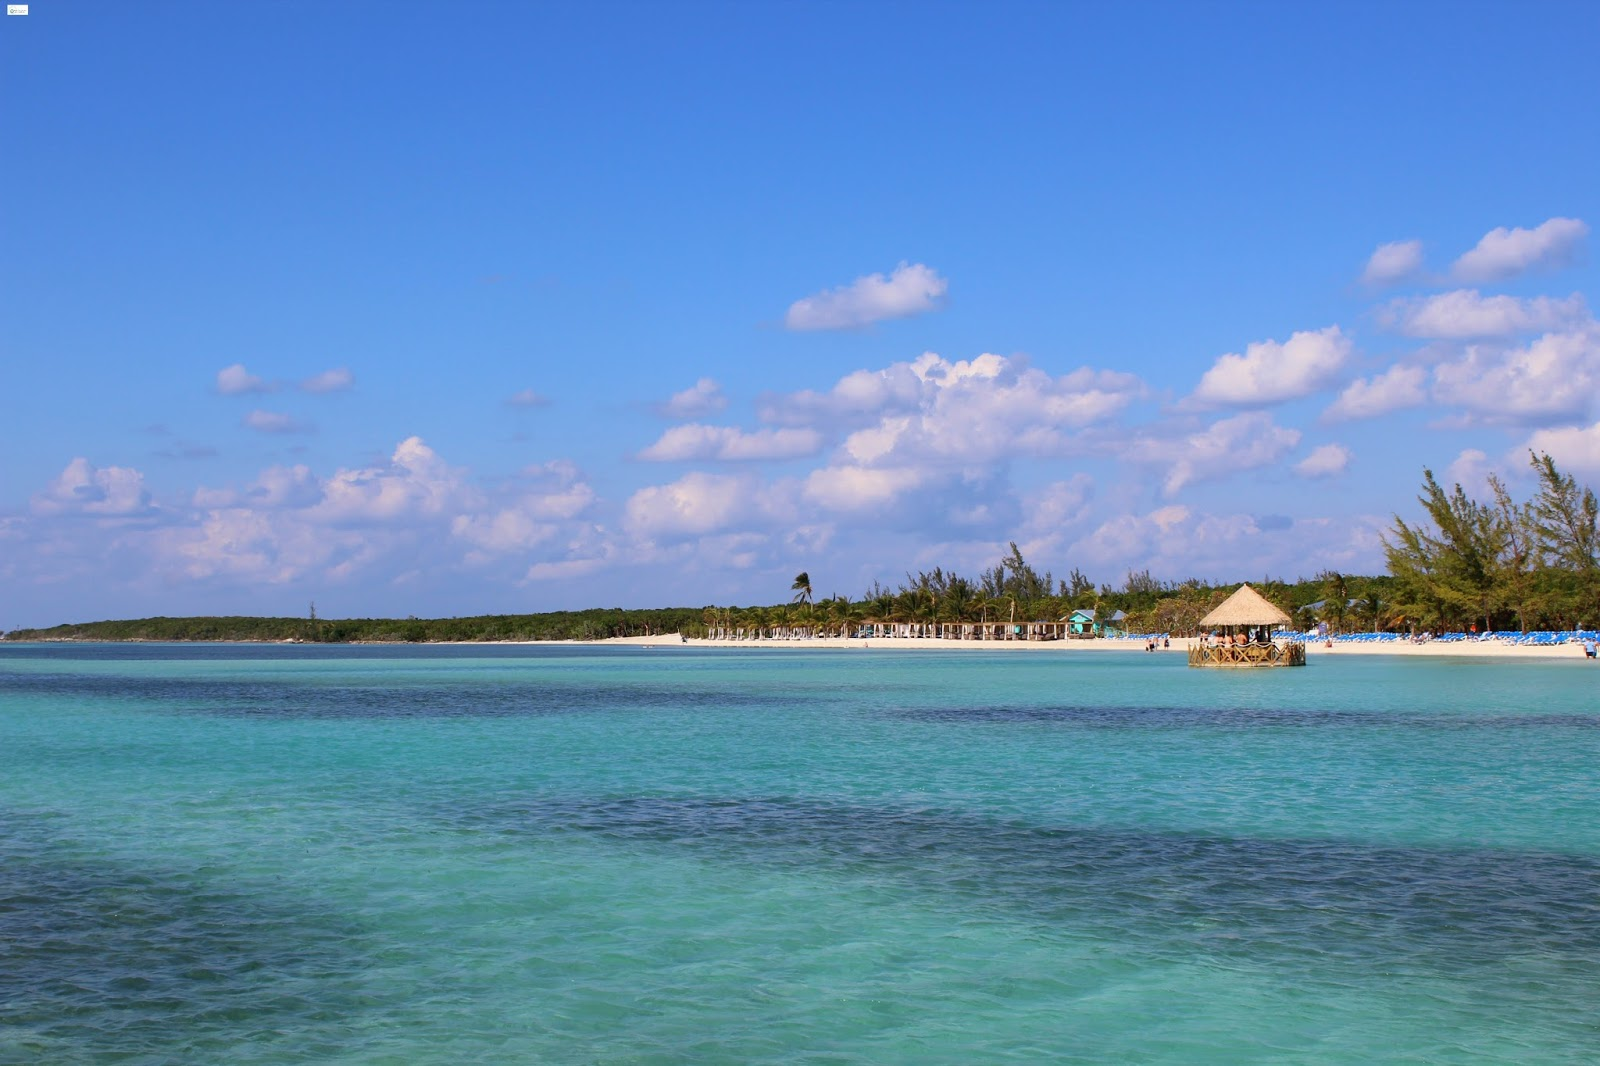 caravan sonnet coco cay bahamas